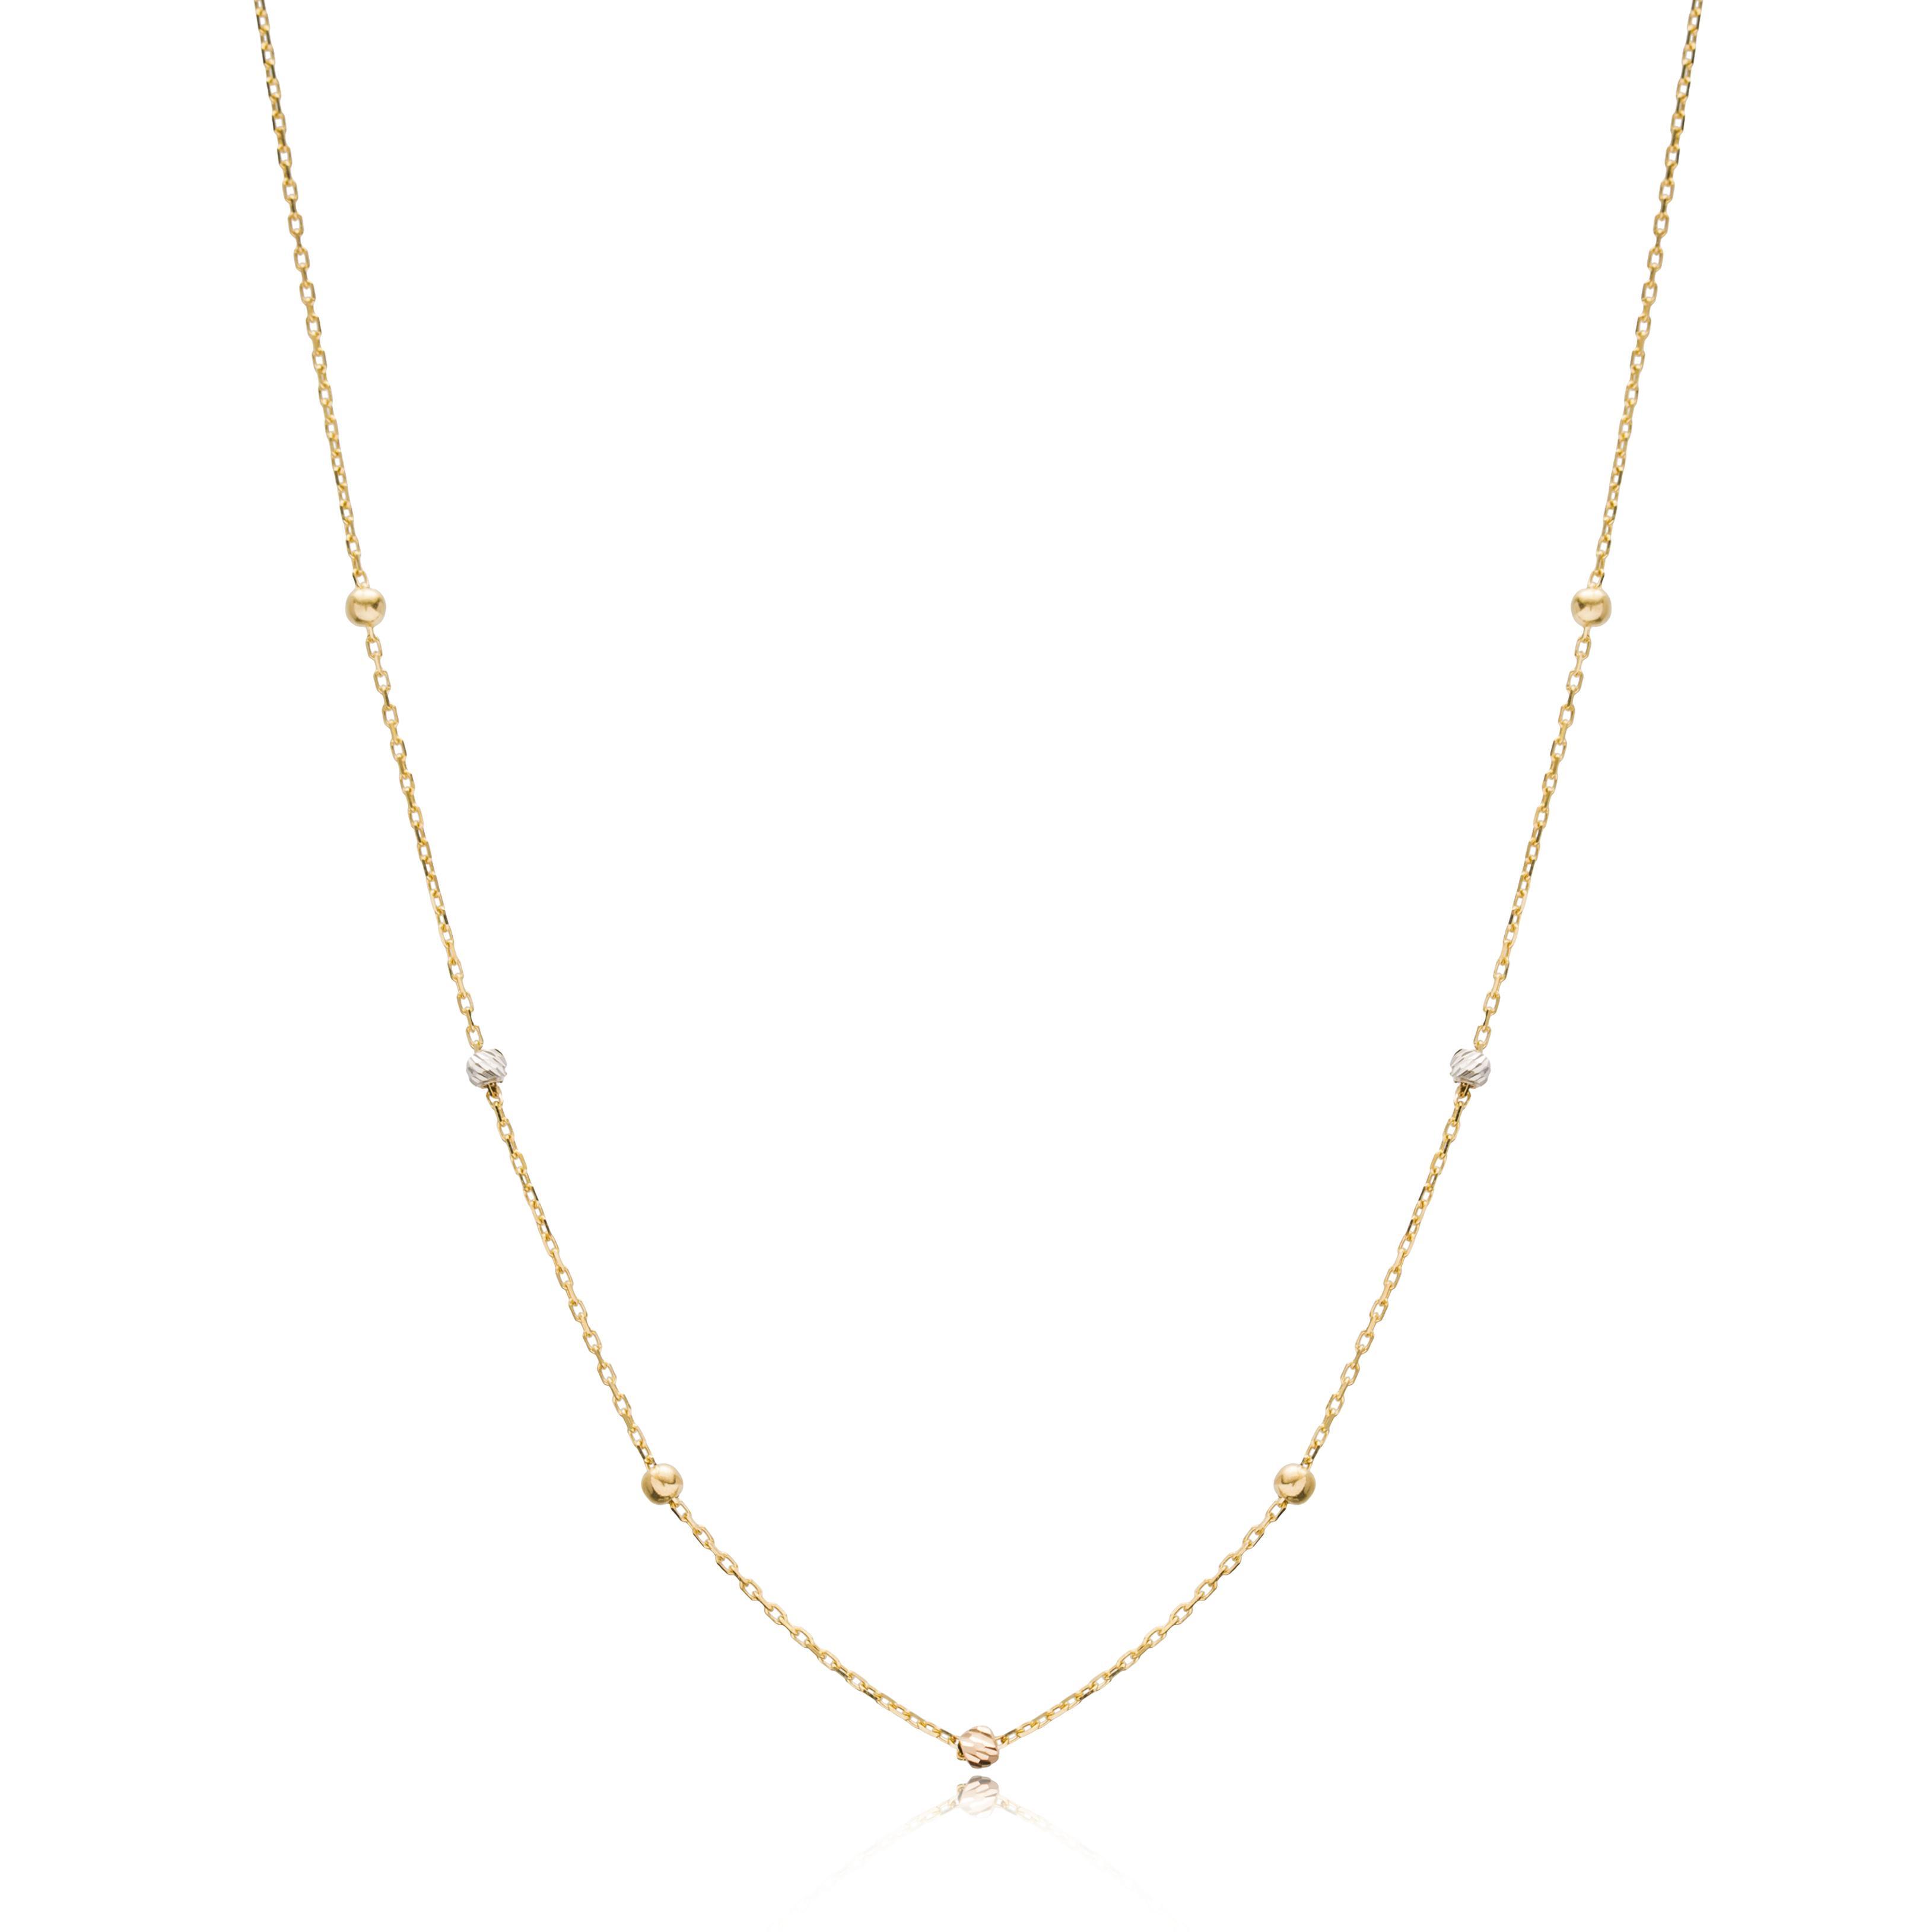 14K Gold Starfish Necklace Wholesale Handmade Turkish Jewelry